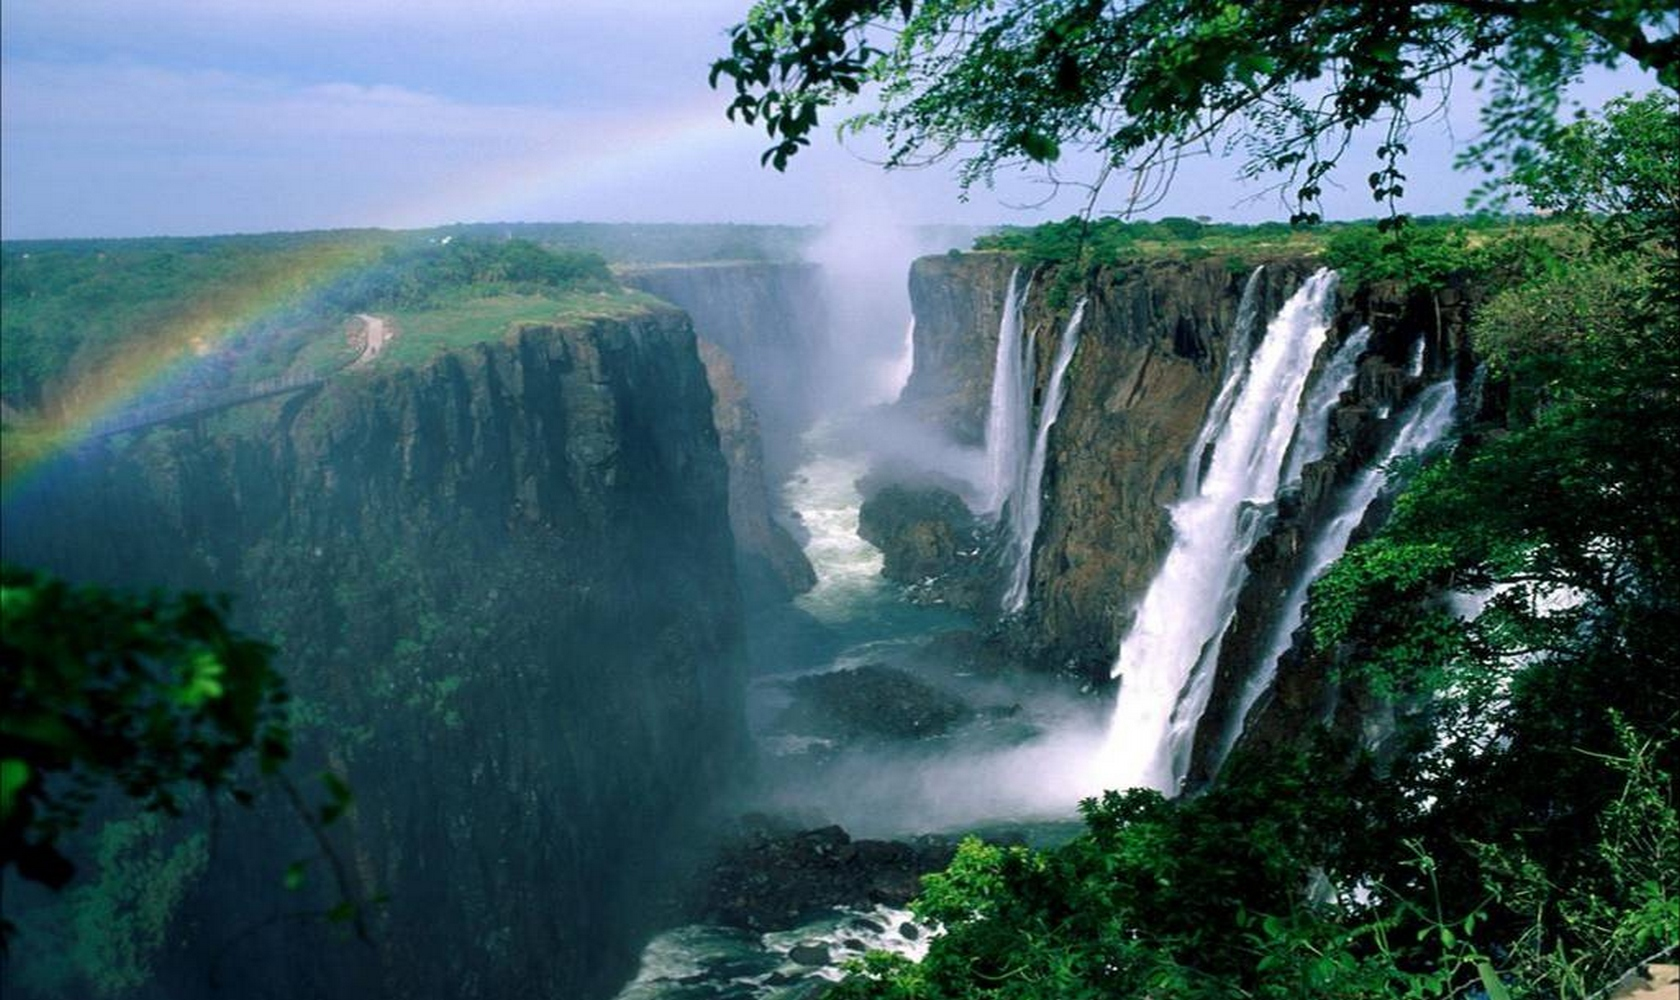 Africa_Chutes_Victoria_019-1680-1000.jpg